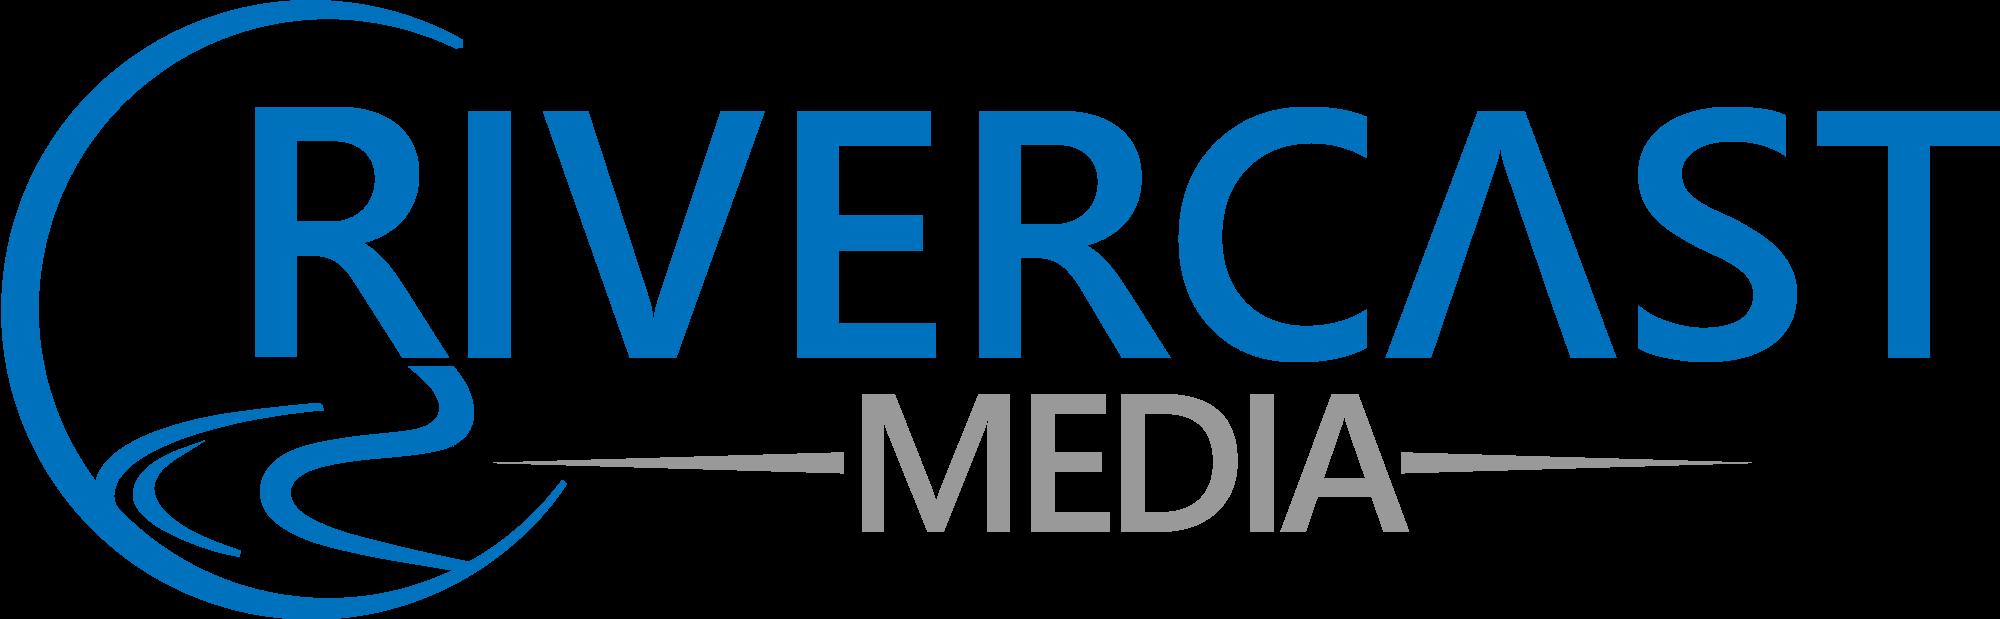 Rivercast Media